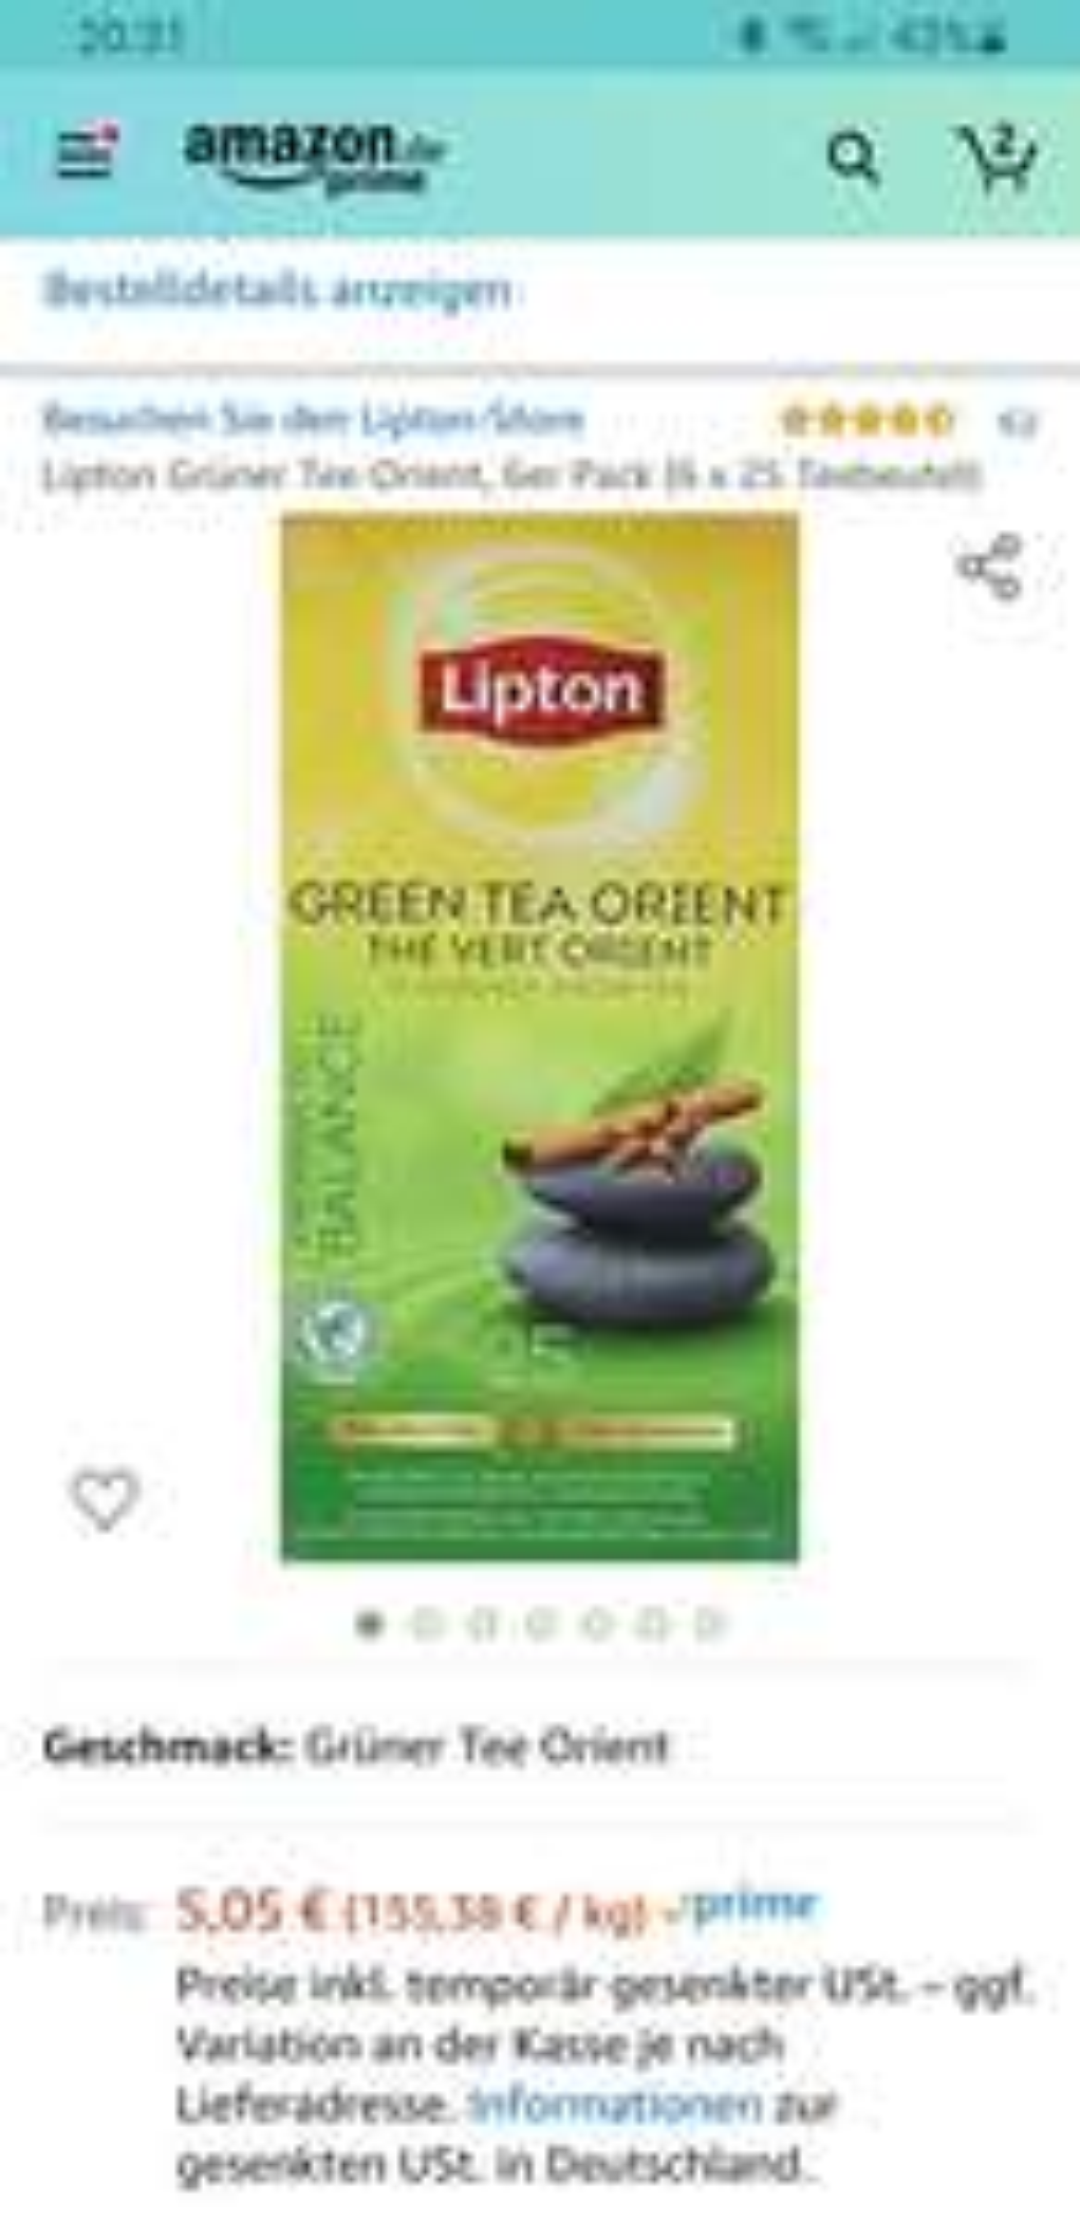 Lipton Grüner Tee Orient, 6er Pack (6 x 25 Teebeutel)